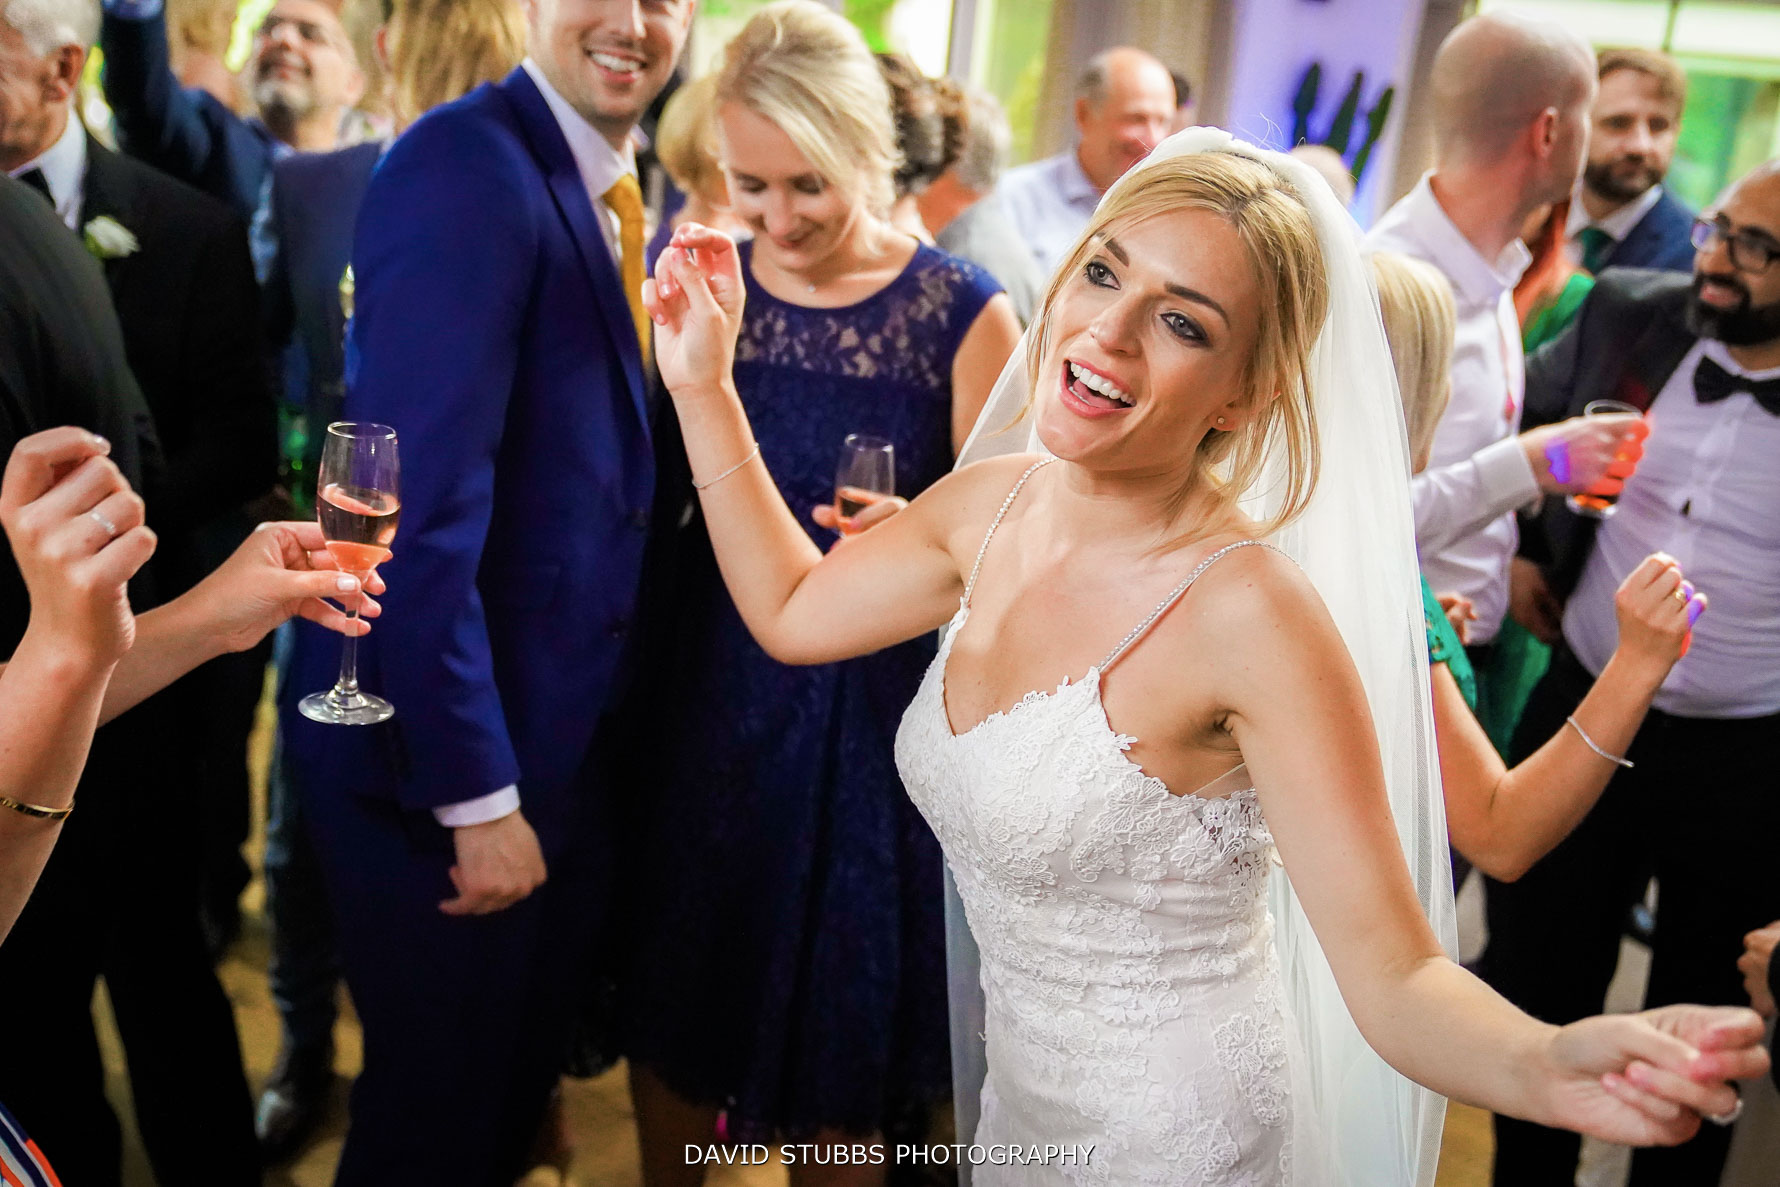 wedding photo at gibbon bridge hotel party